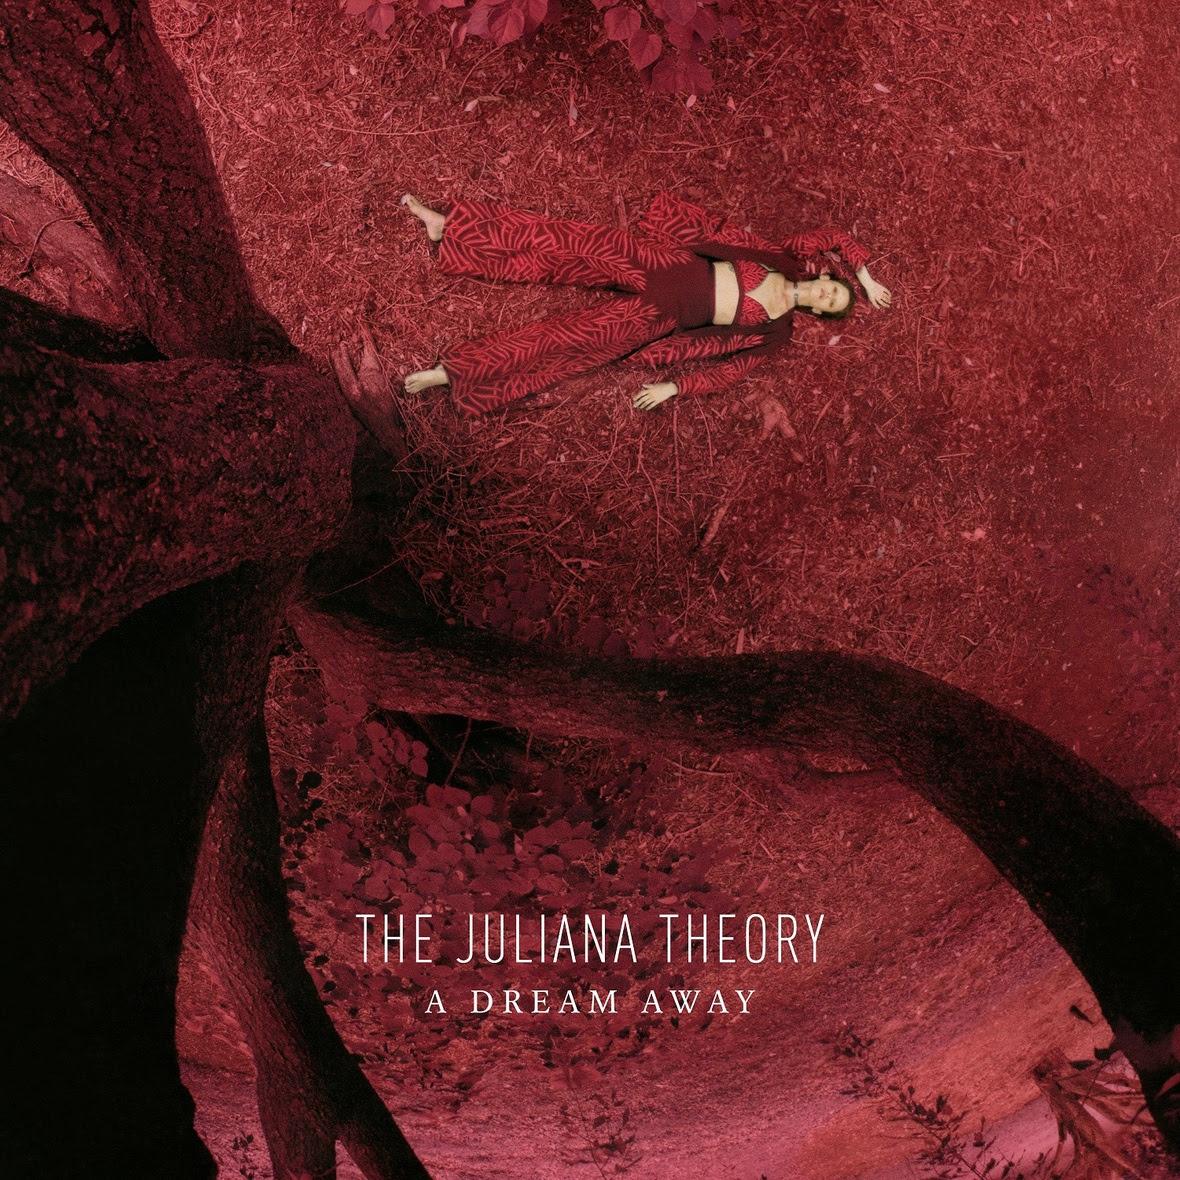 Juliana theory